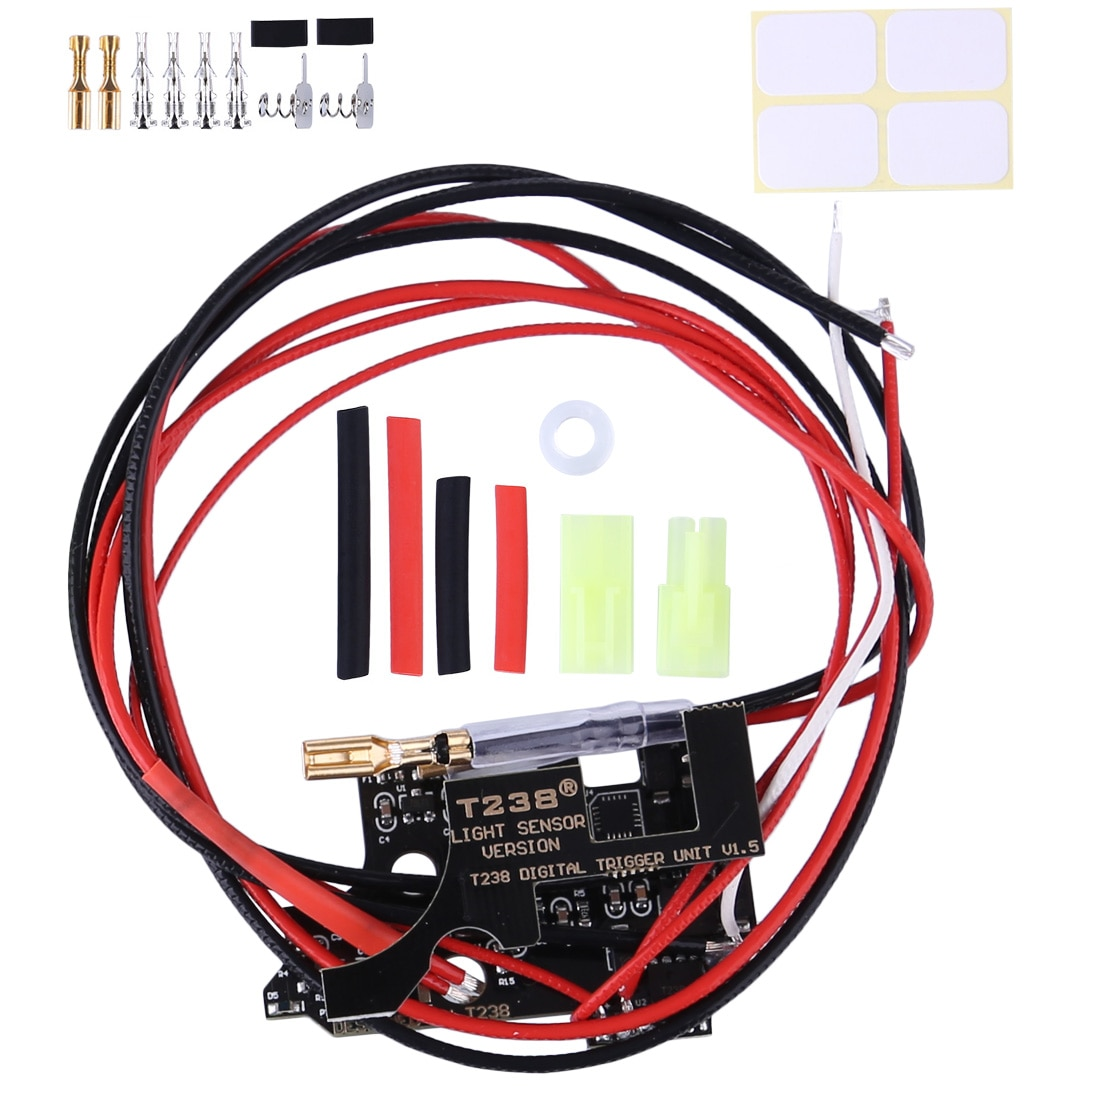 1pcs Version 1.7 T238 Programmable MOSFET Electronic Fire Control Module For XWE M4 / JM Gen.9 / FB / Jingji / JQ No.2 Gearbox